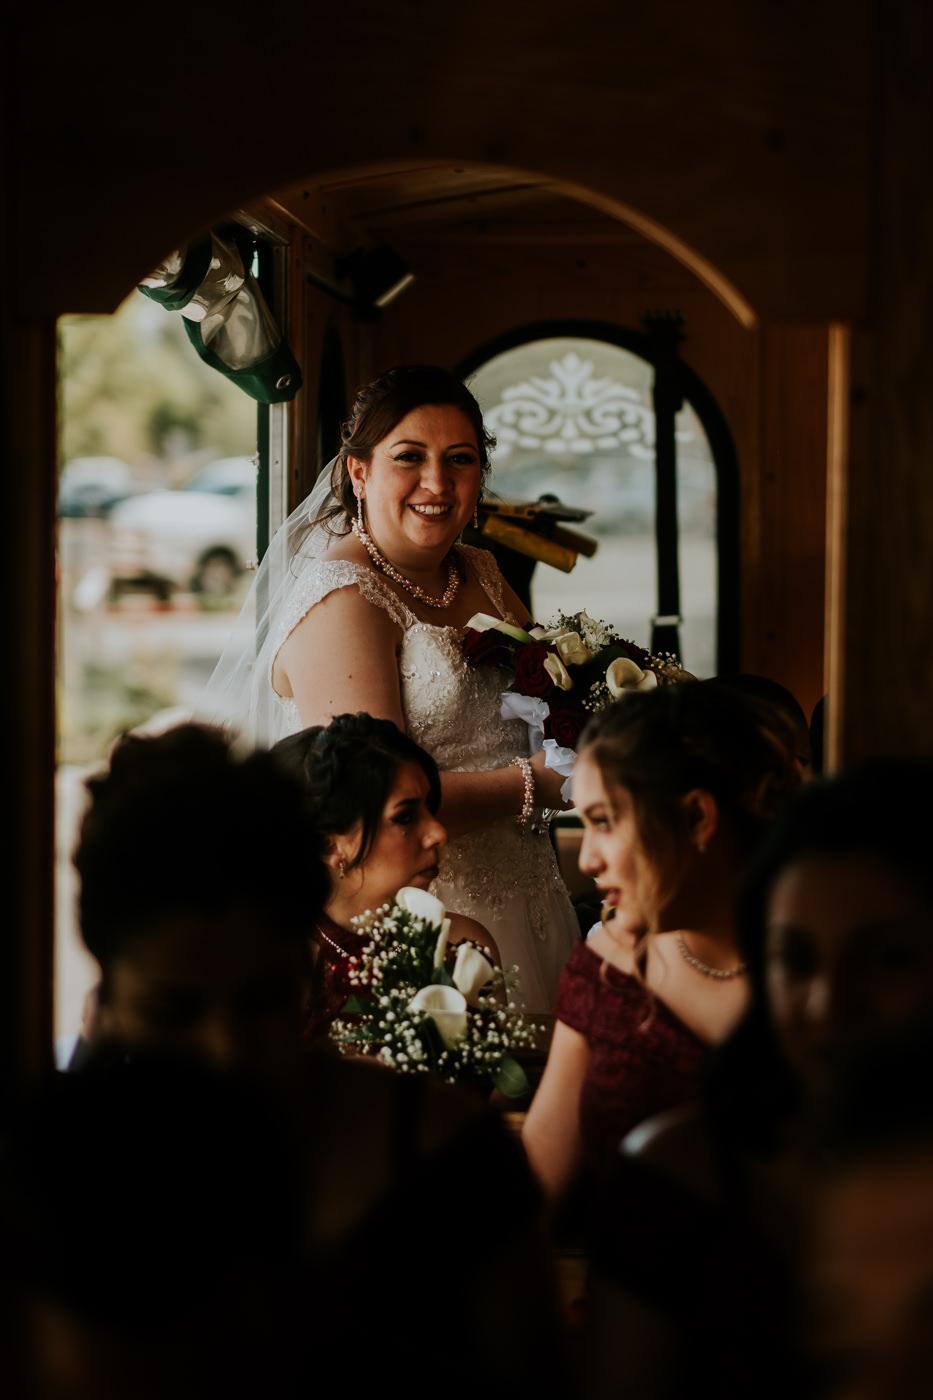 Liza+Gene.Wedding.Blog©mileswittboyer.com2018-82.jpg